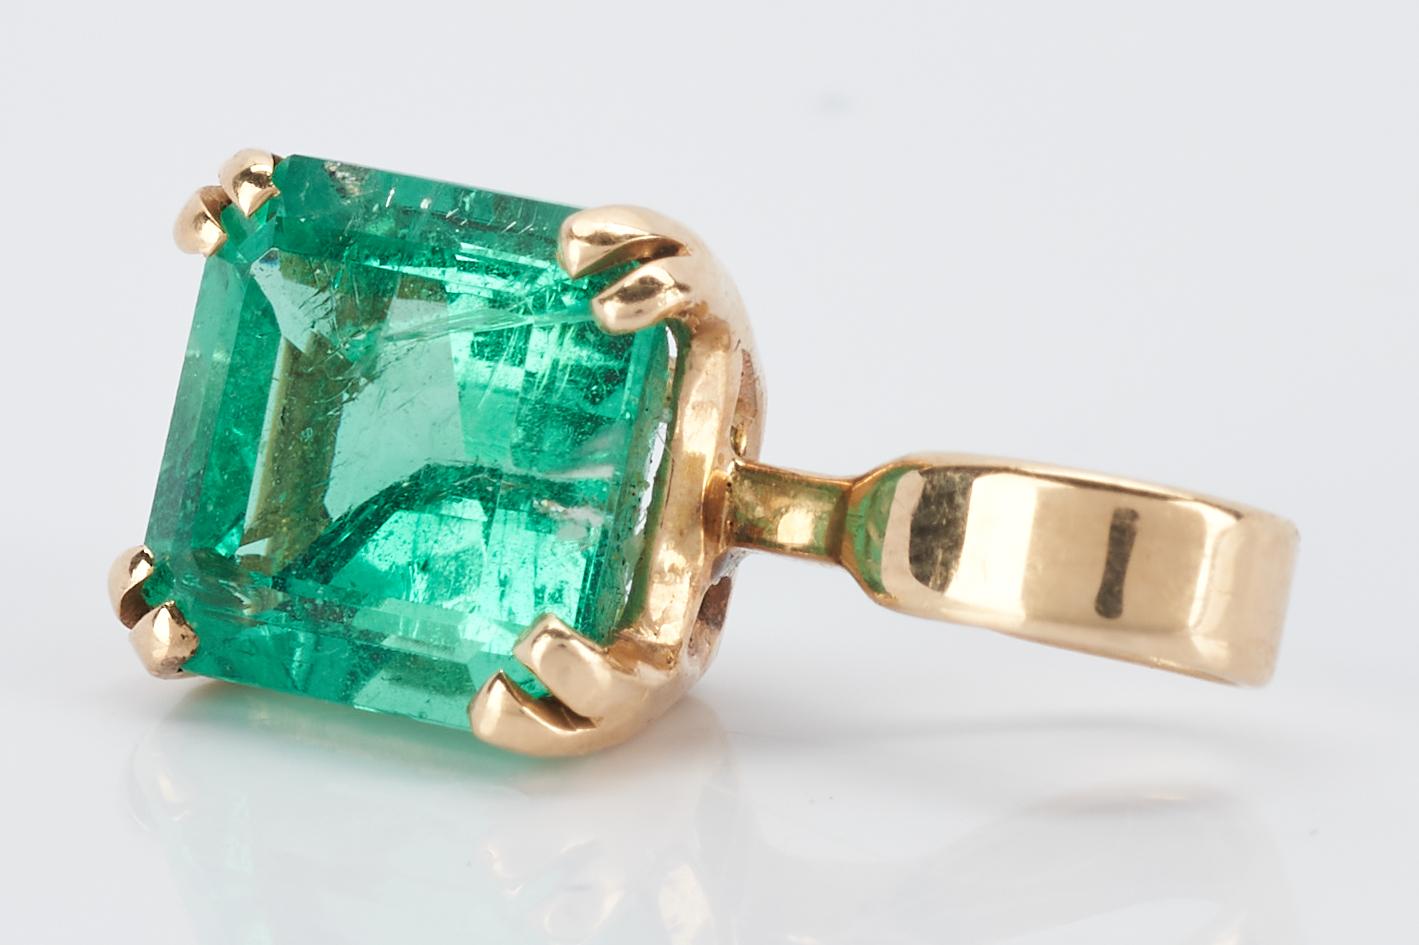 Lot 252: 14K Gold & Emerald Pendant